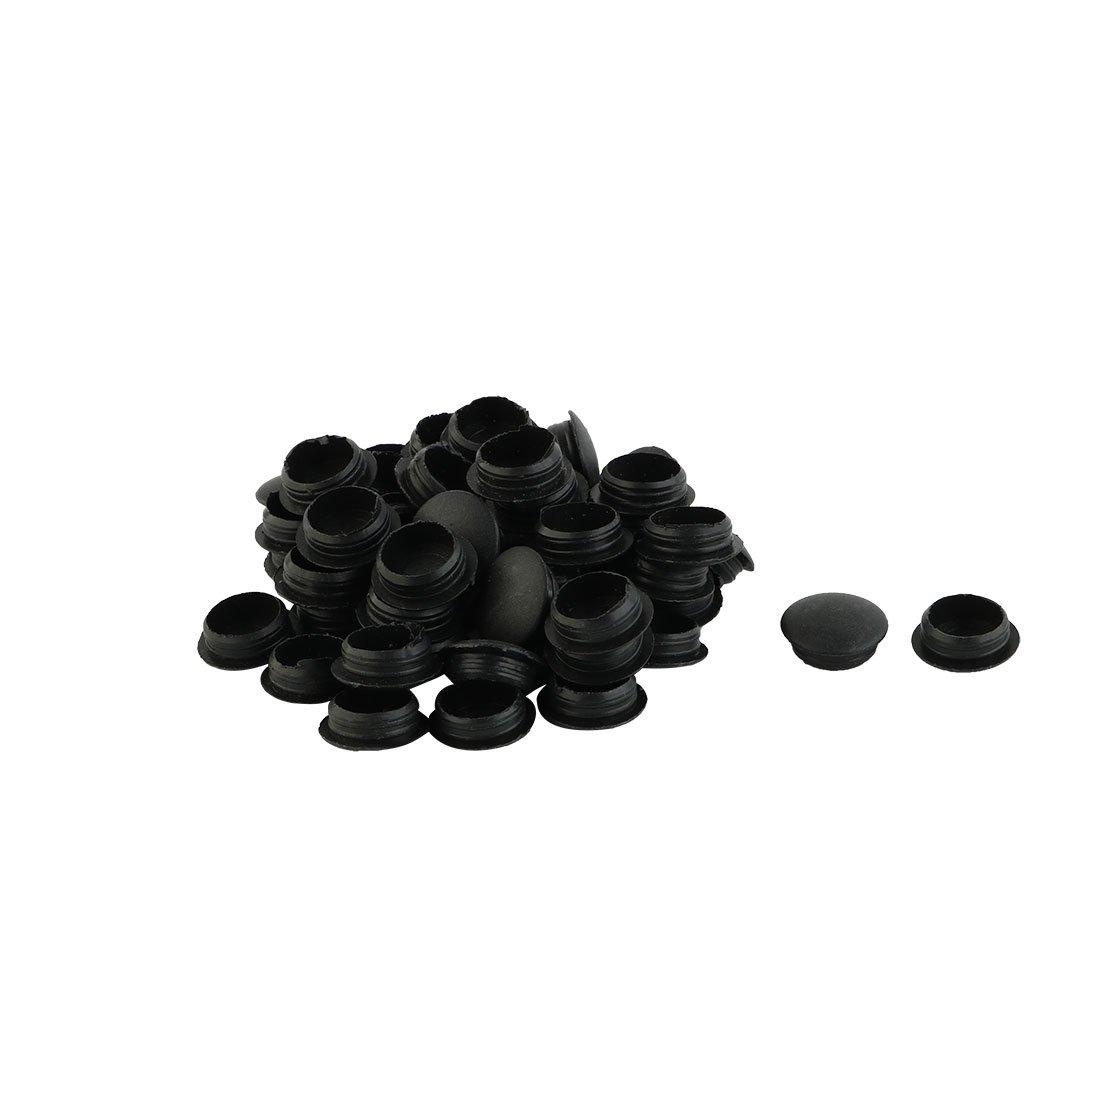 uxcell Plastic Flush Type Locking Hole Cap Covers Bung Tube Insert 12mm Dia 50pcs Black a16010500ux1768